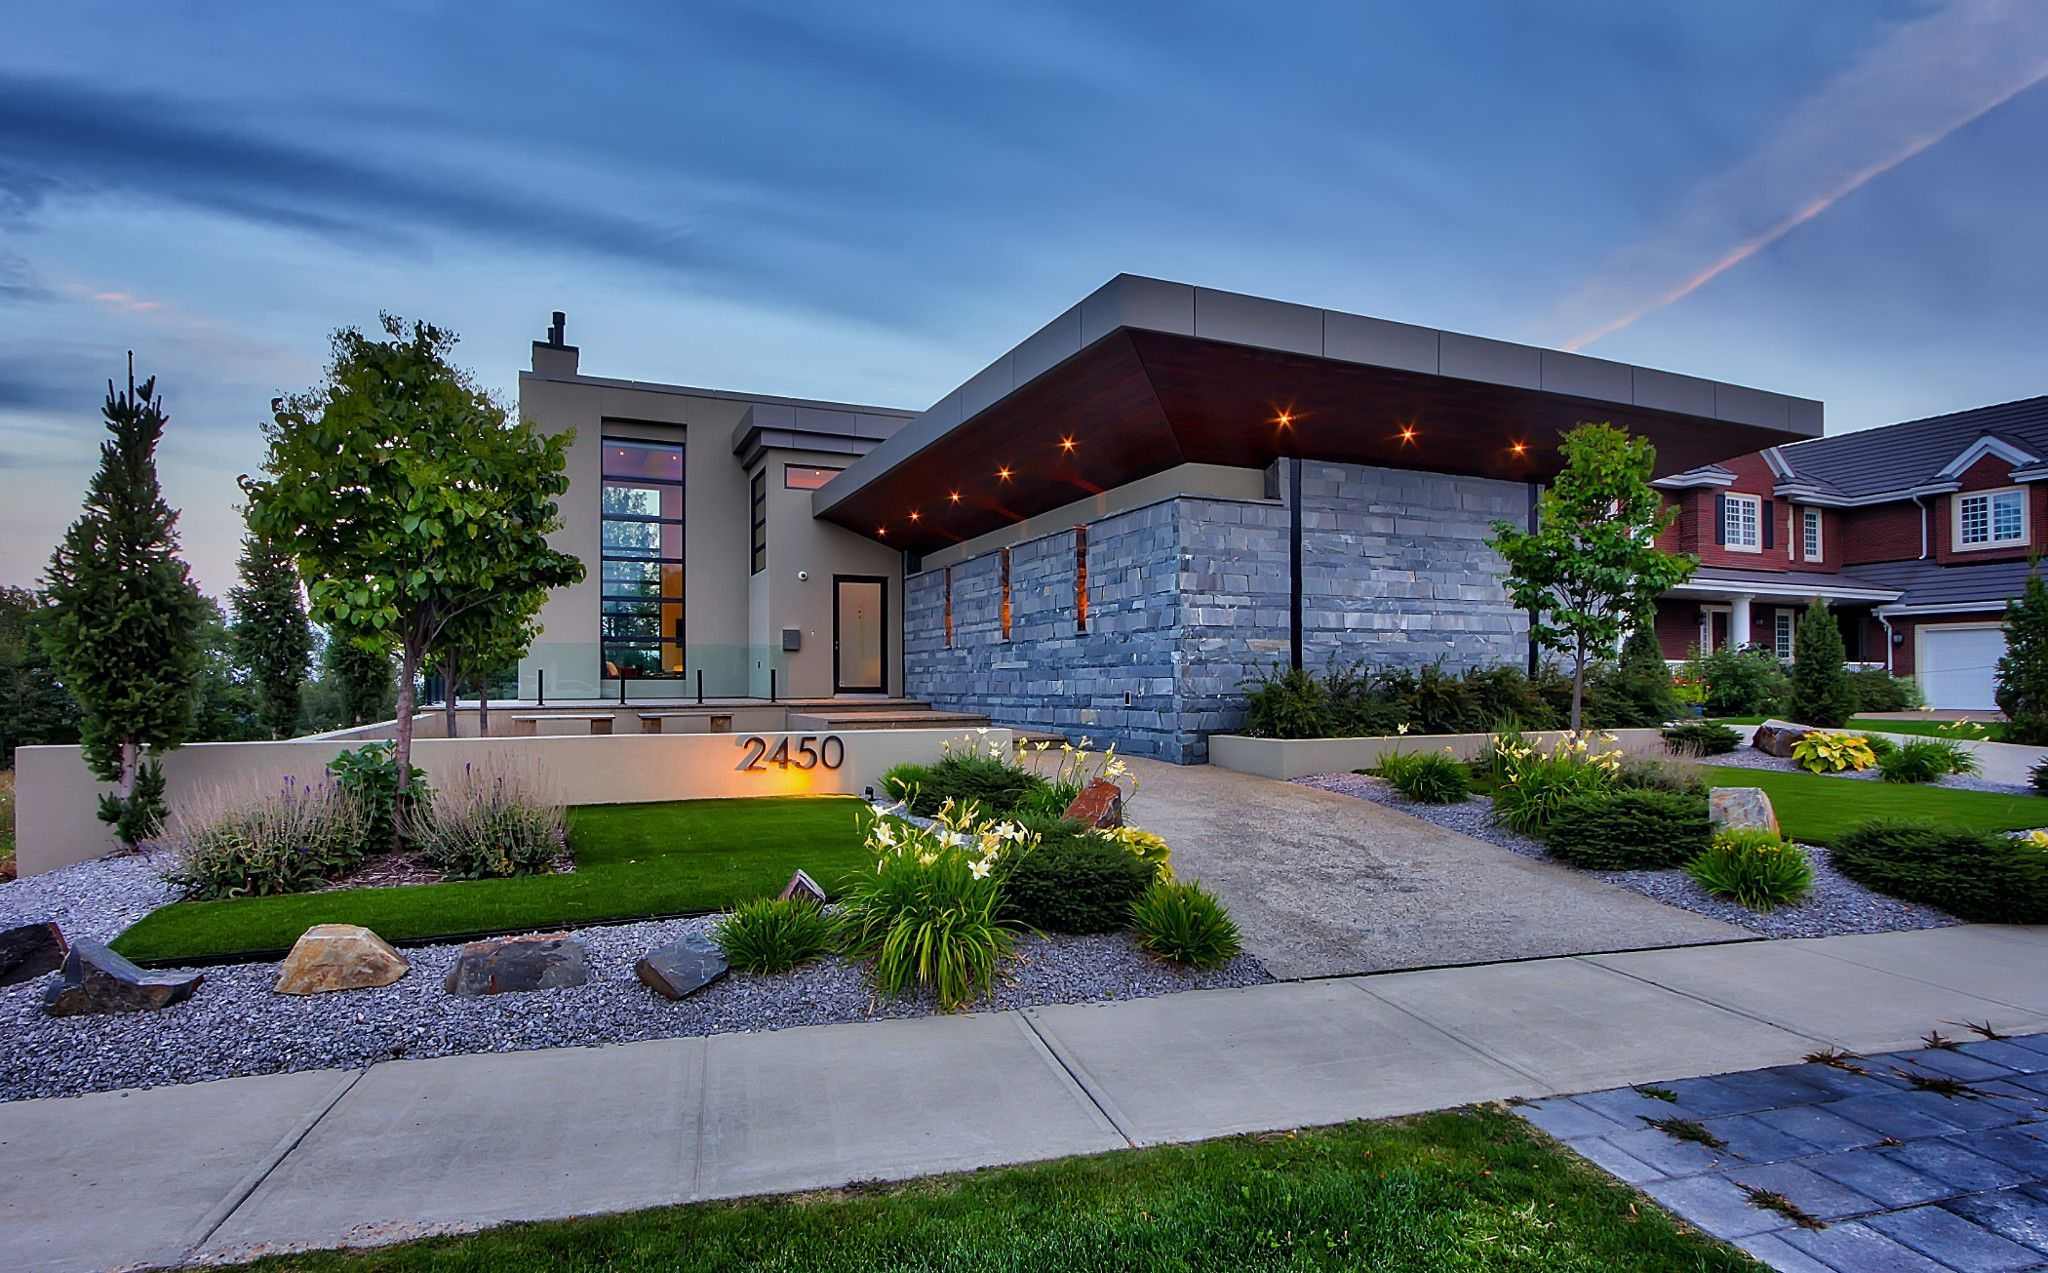 Main Photo: 2450 Cameron Ravine Drive NW in Edmonton: House for sale